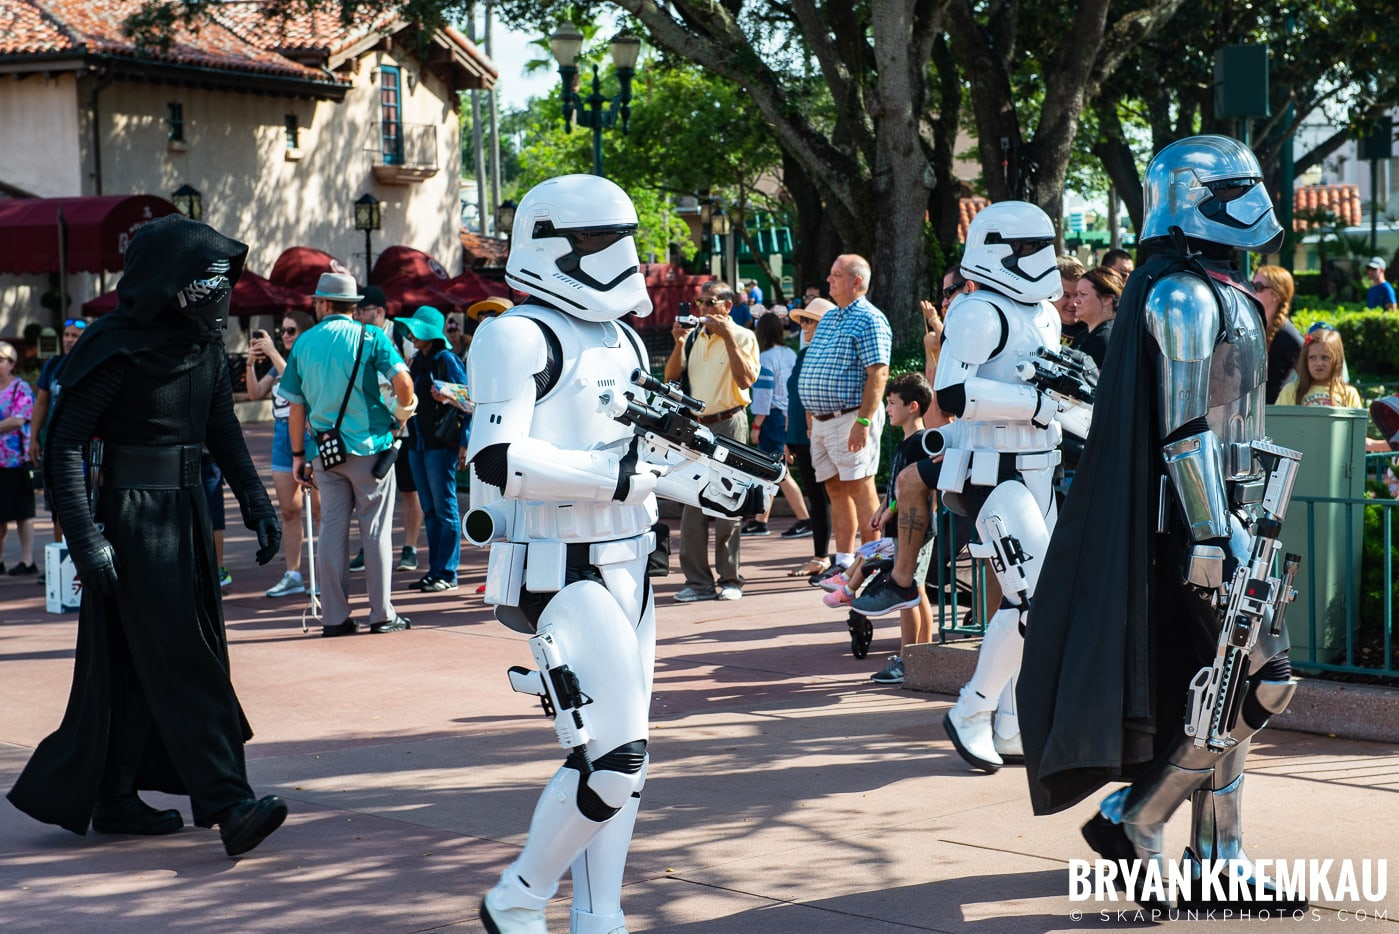 Walt Disney World Vacation: Day 3 (Disney's Hollywood Studios / Magic Kingdom) October 1st 2019 (55)